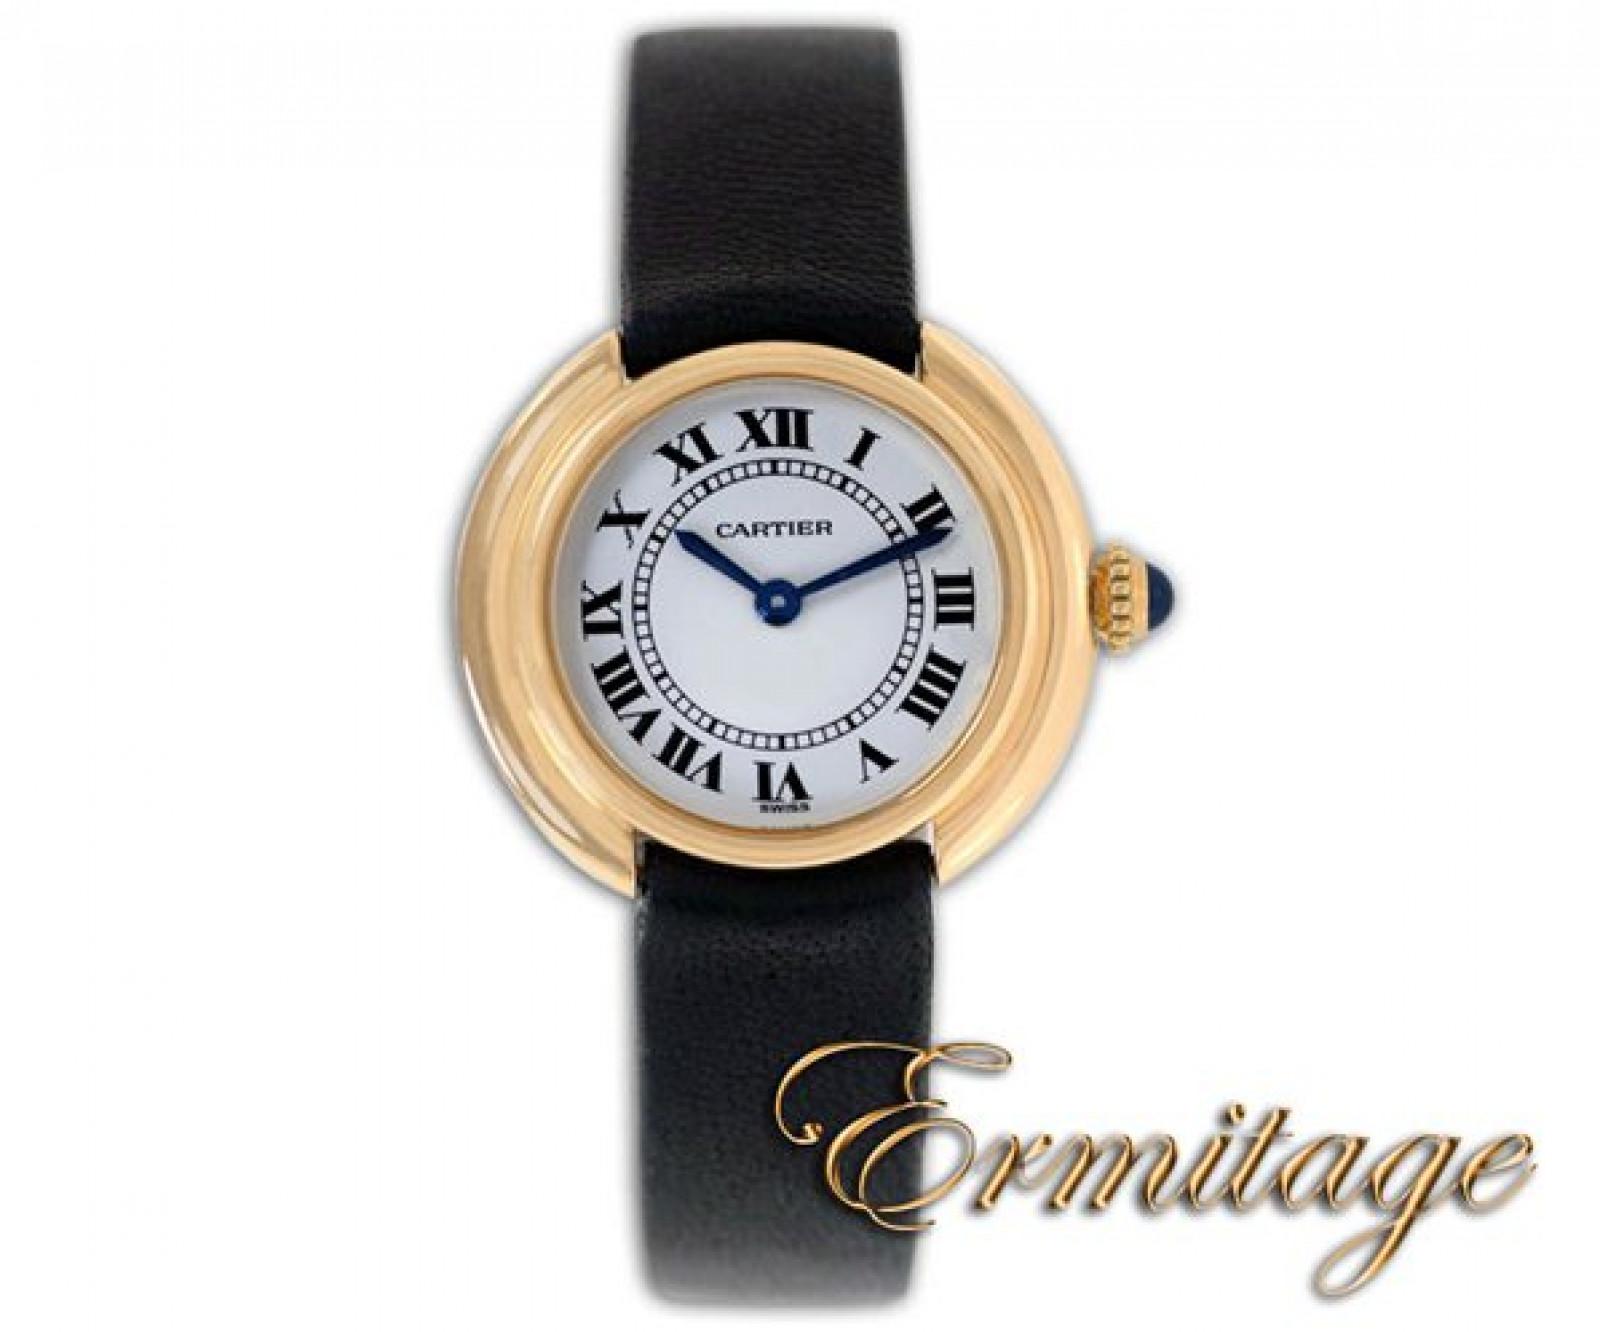 Cartier Paris 670 Gold